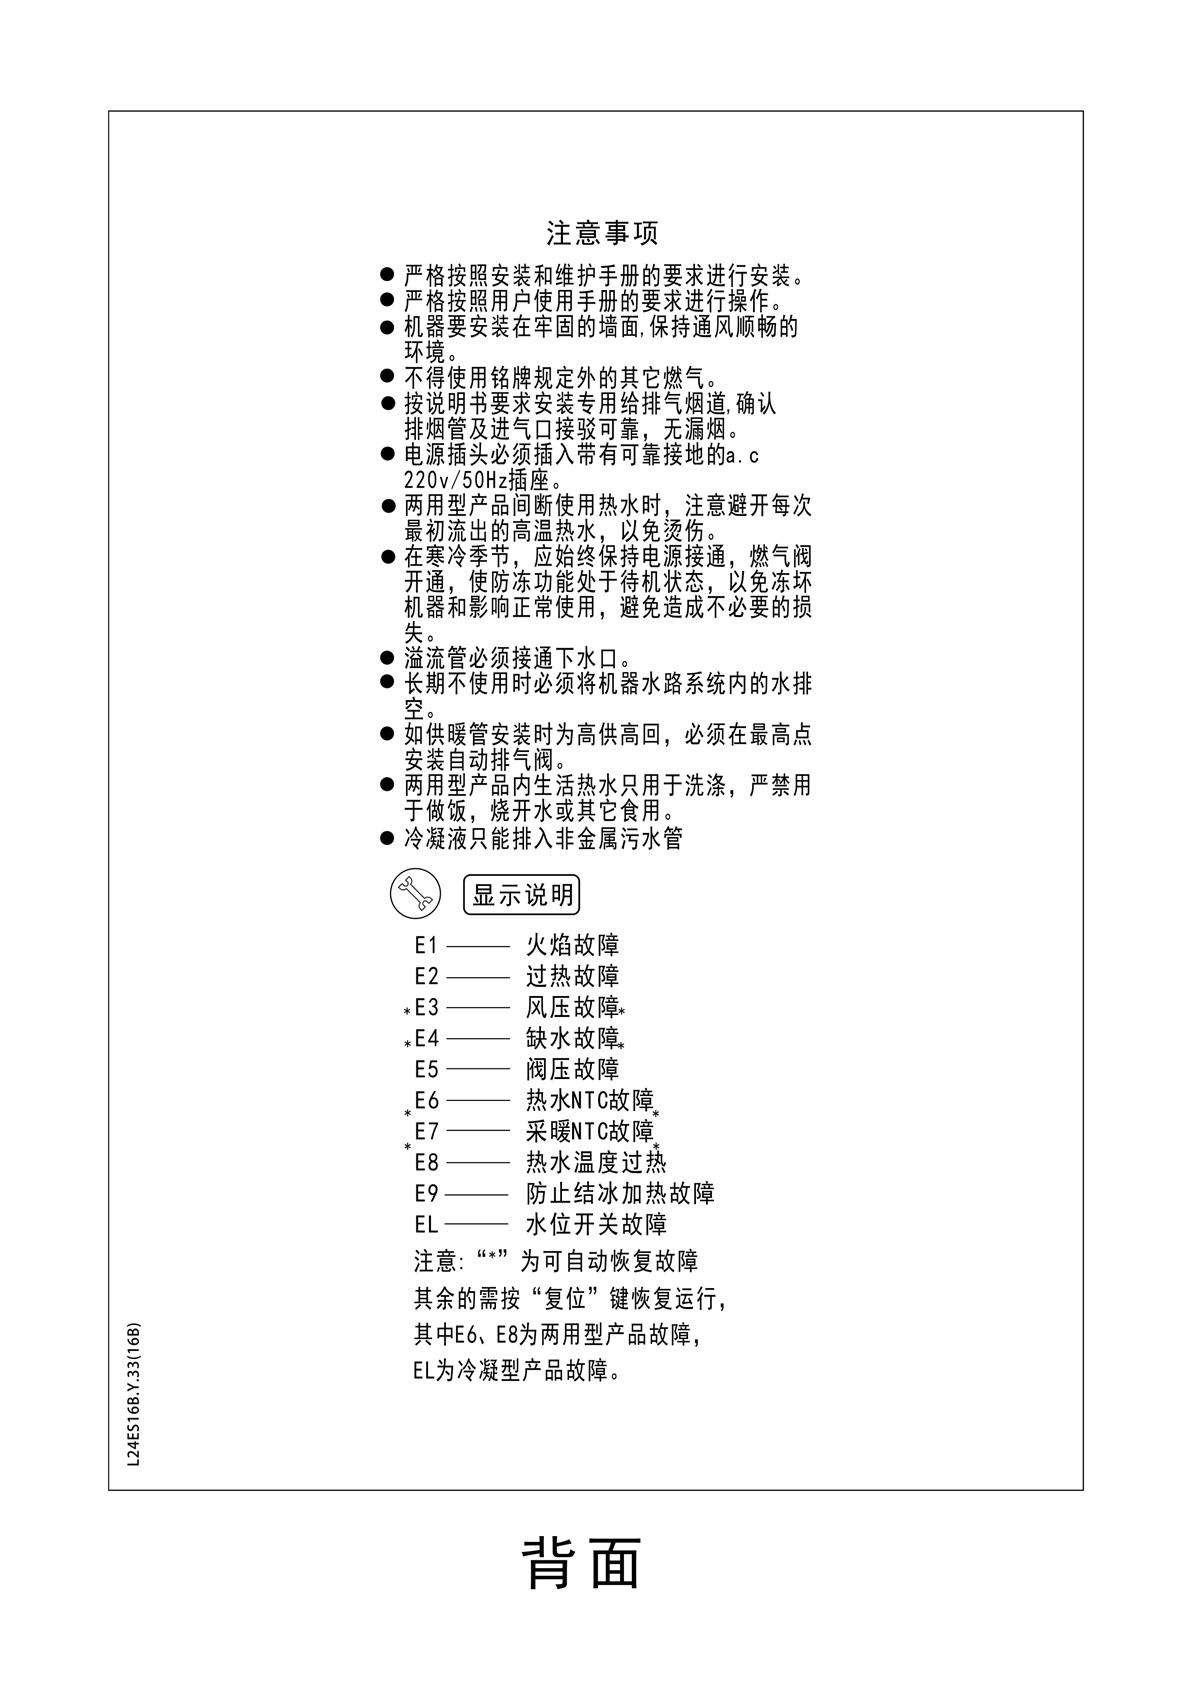 ES16B系列-用户使用手册-10_02.jpg